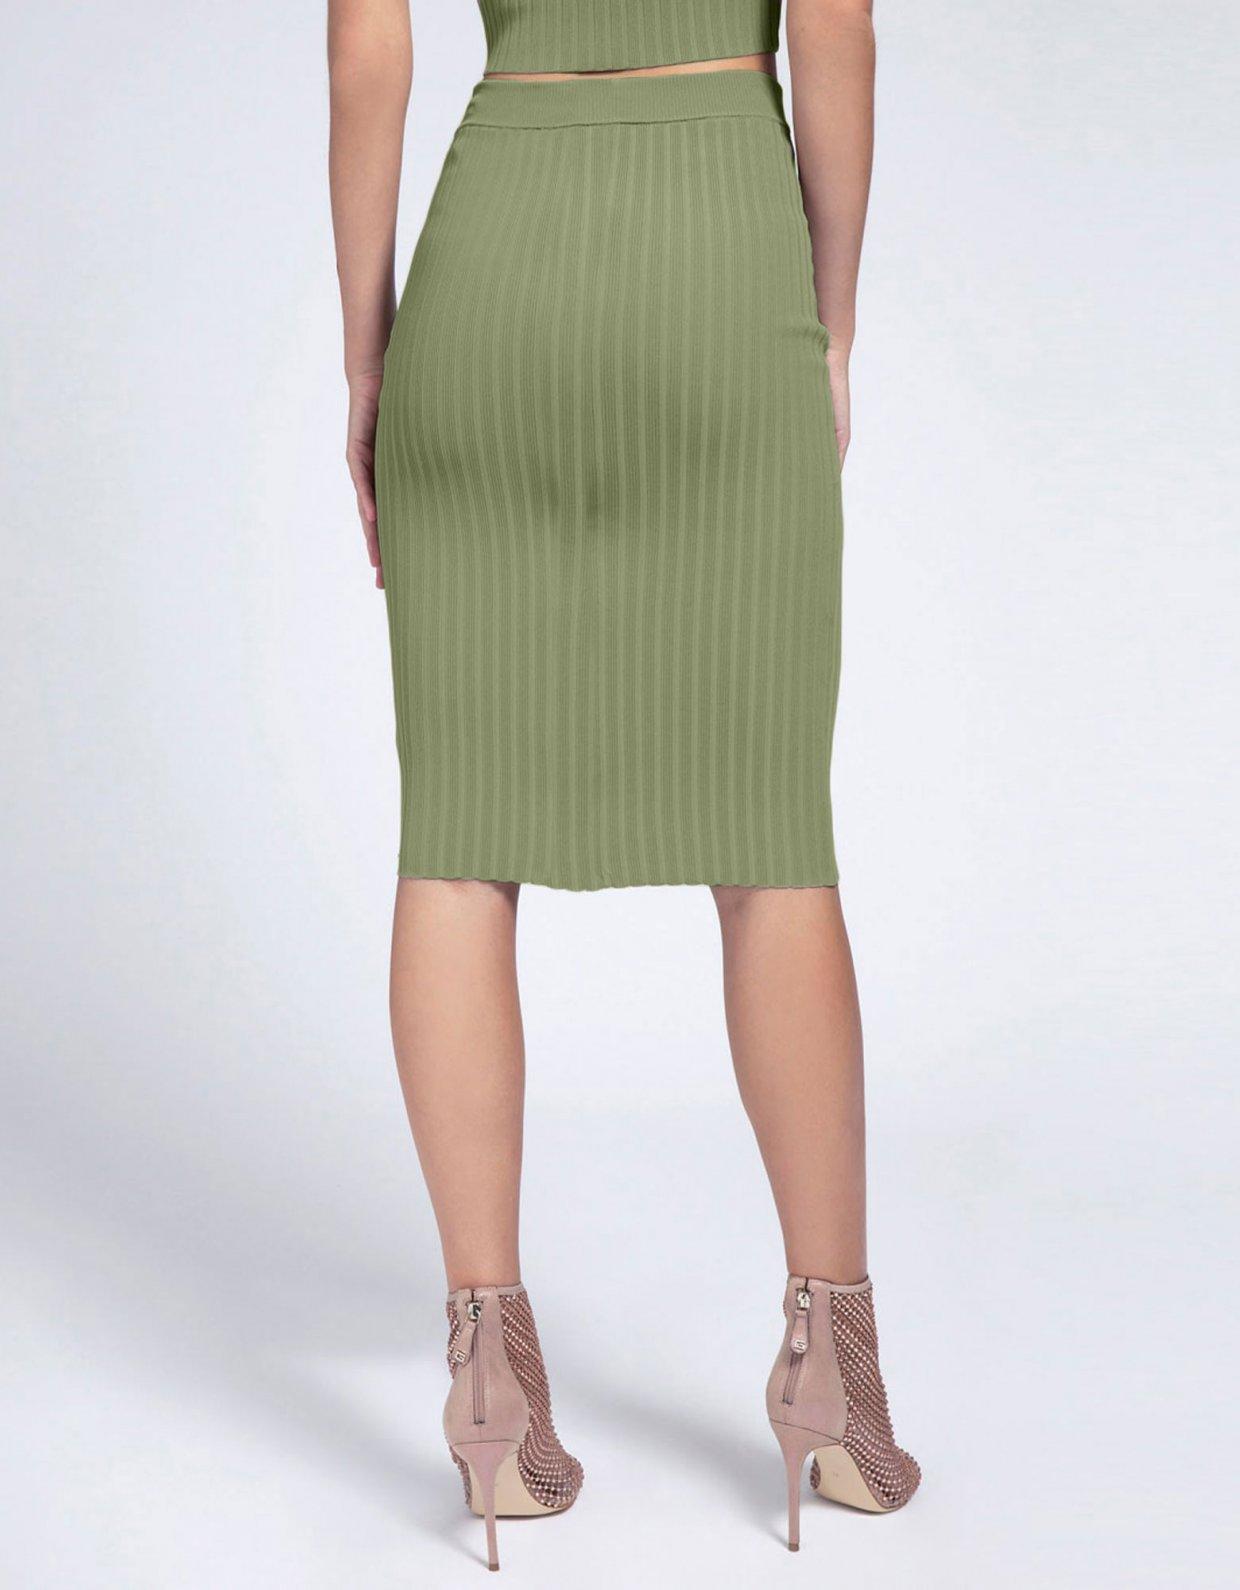 Guess Ada rib skirt green